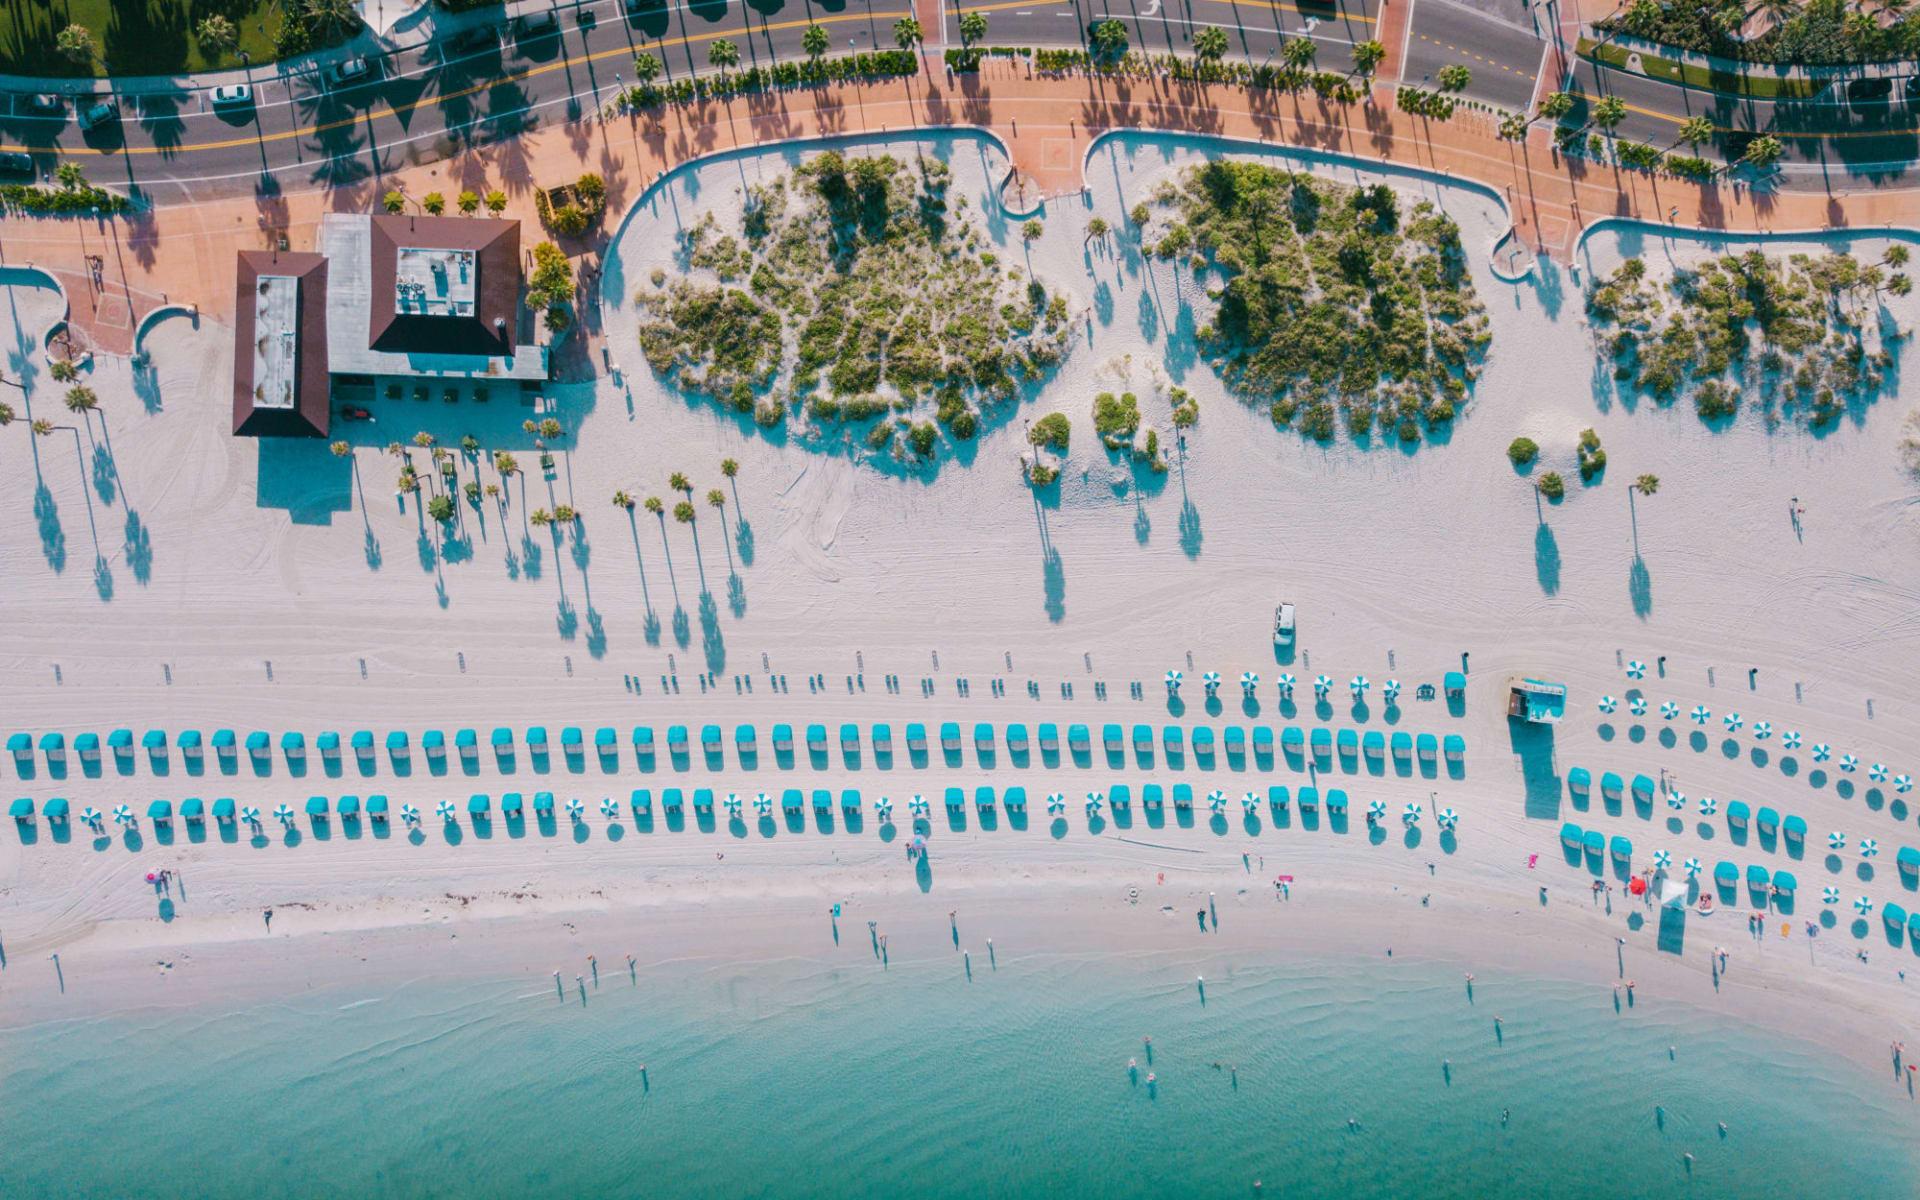 Best of Florida ab Miami: Clearwater Beach Walk Aerial - Clearwater Beach